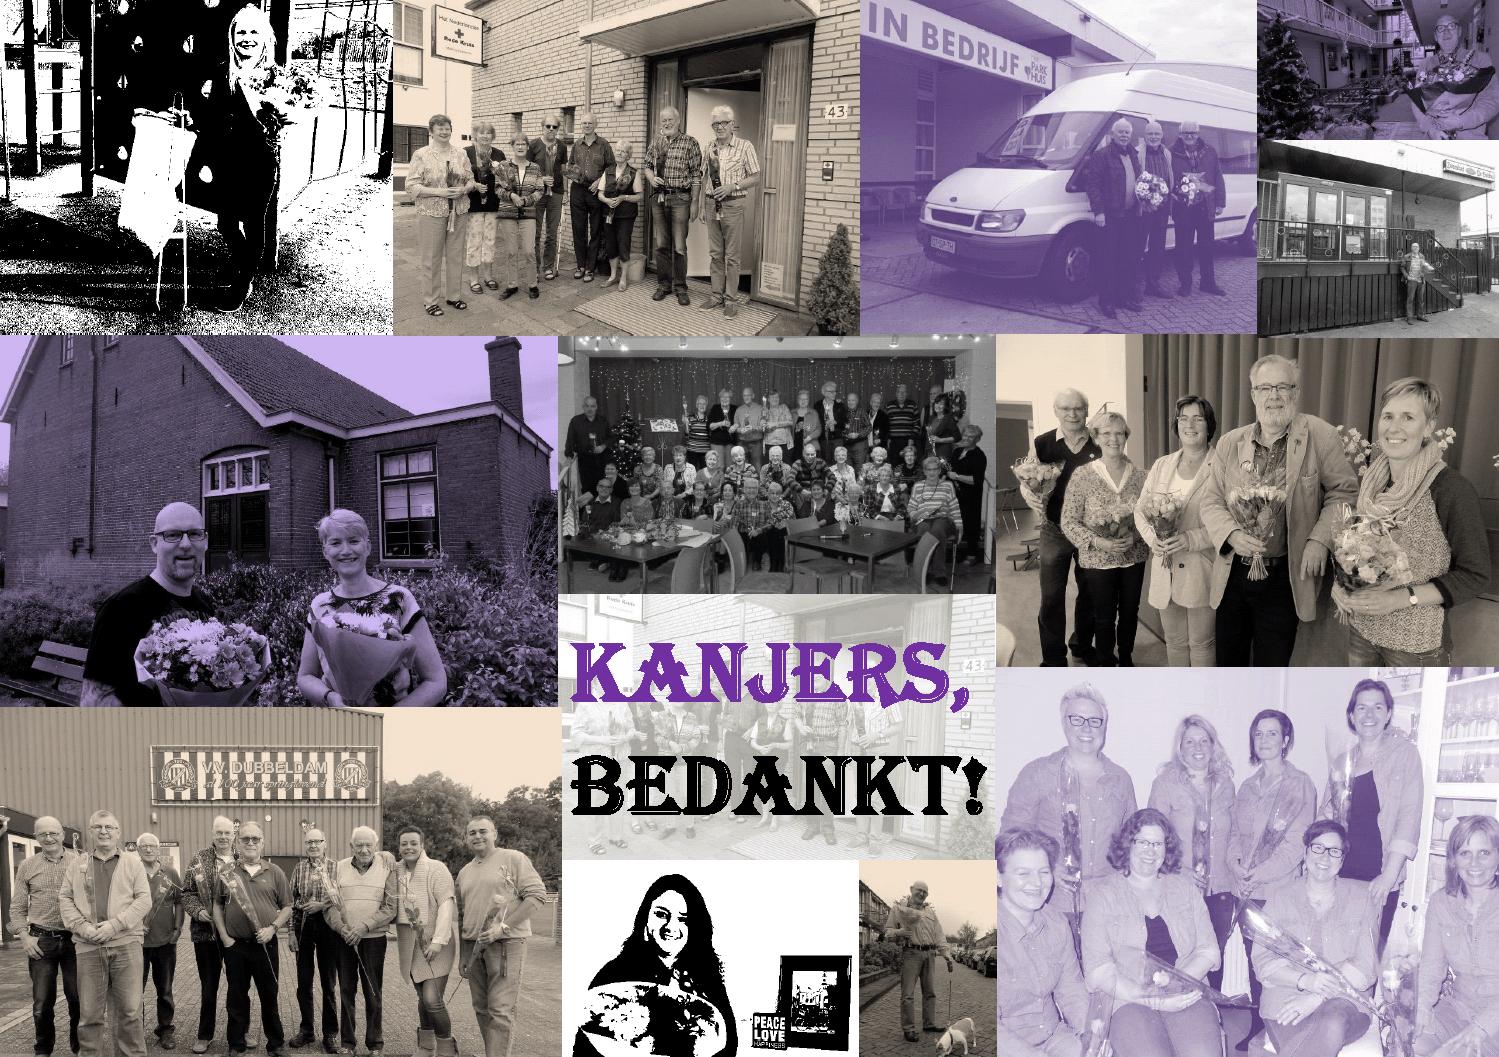 kanjers-bedankt-dubbeldam-2016